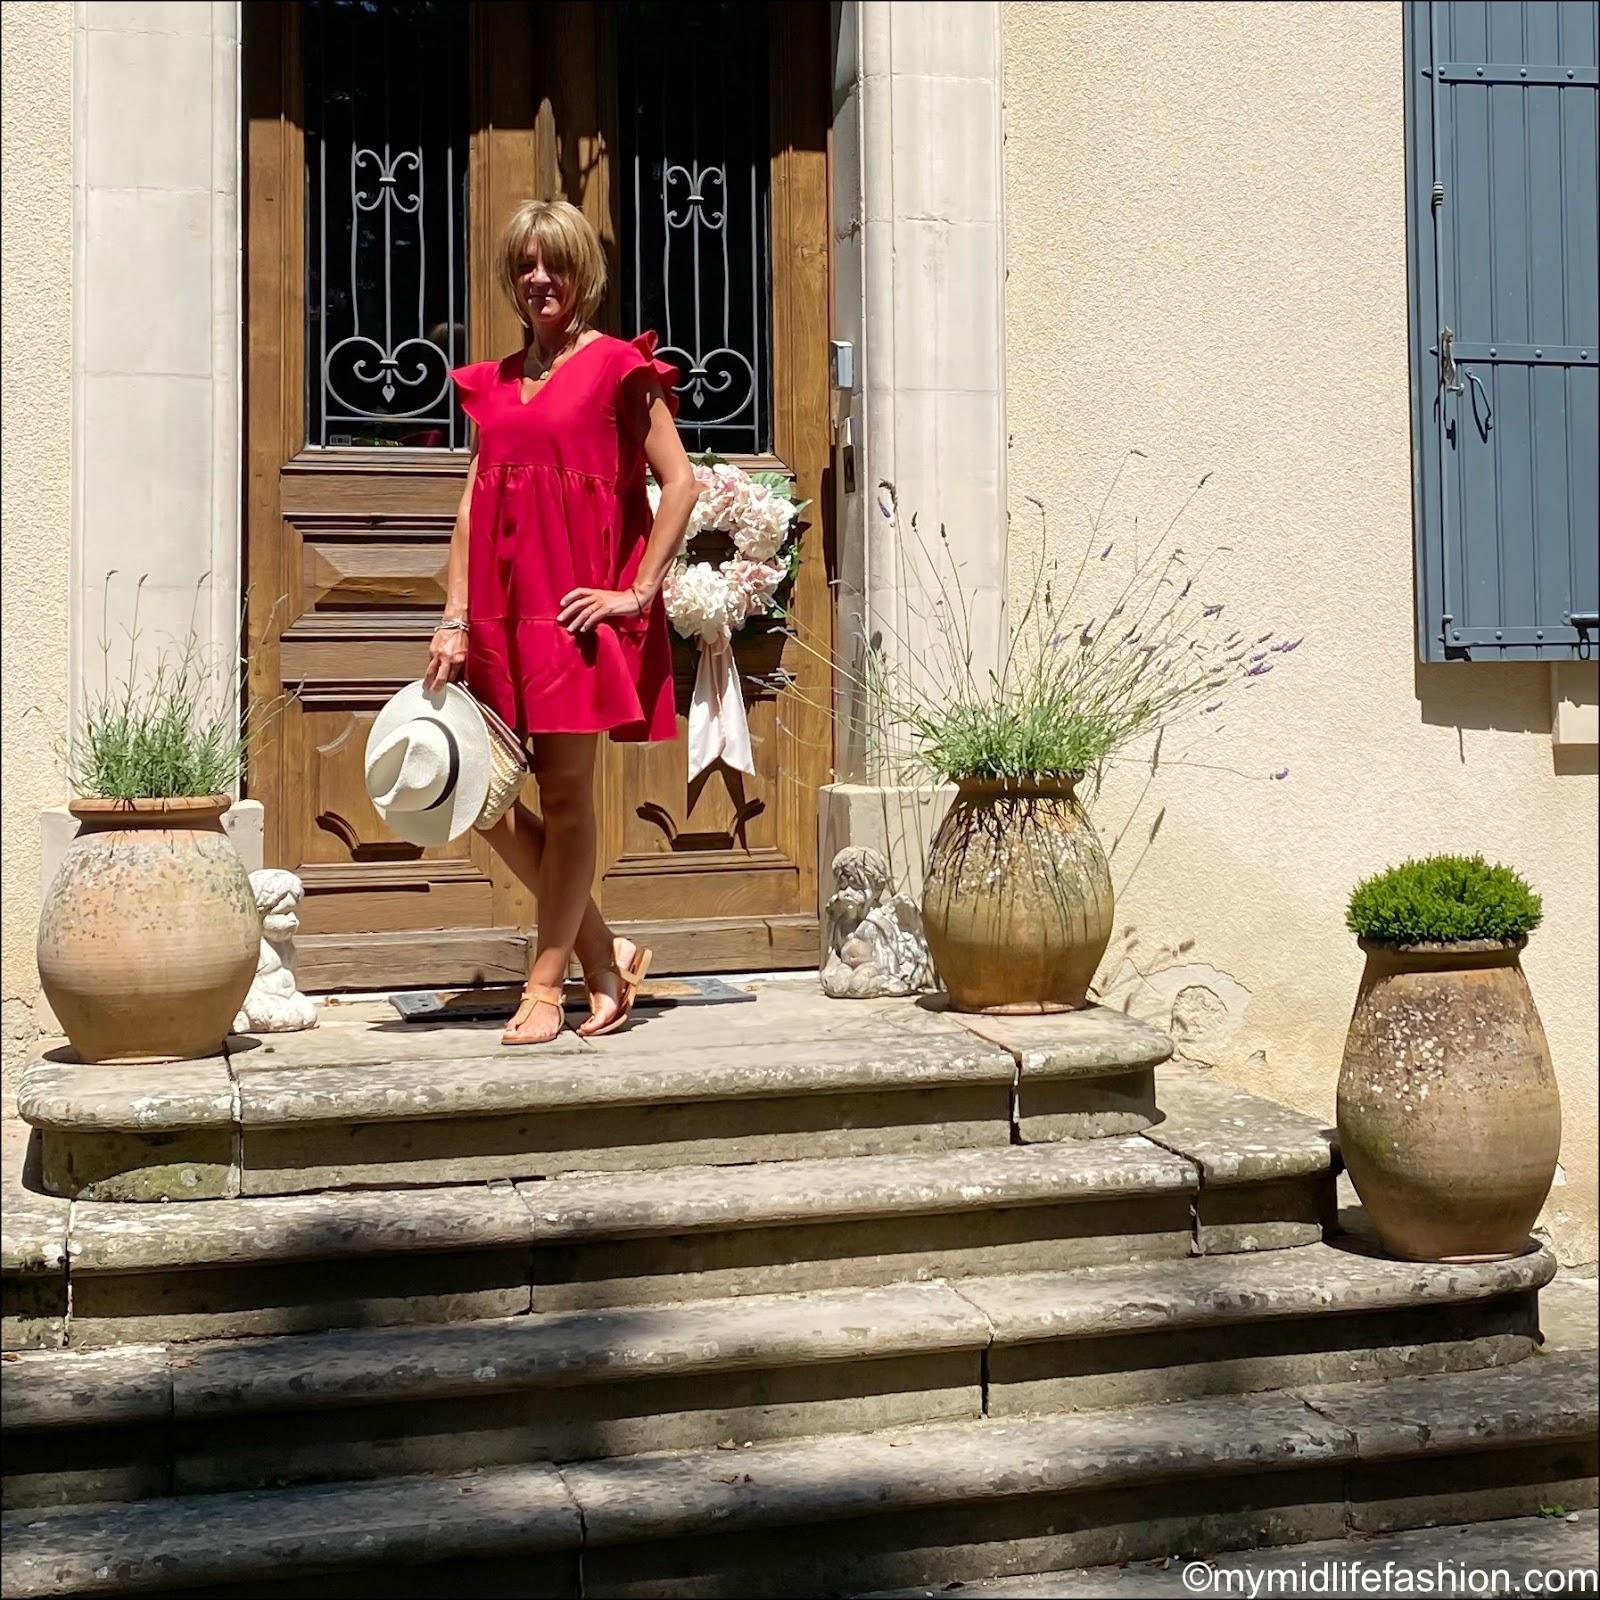 my midlife fashion, initially London Ibiza Clutch, Carvela sandals, zara Panama hat, riyka ceres red linen tiered dress